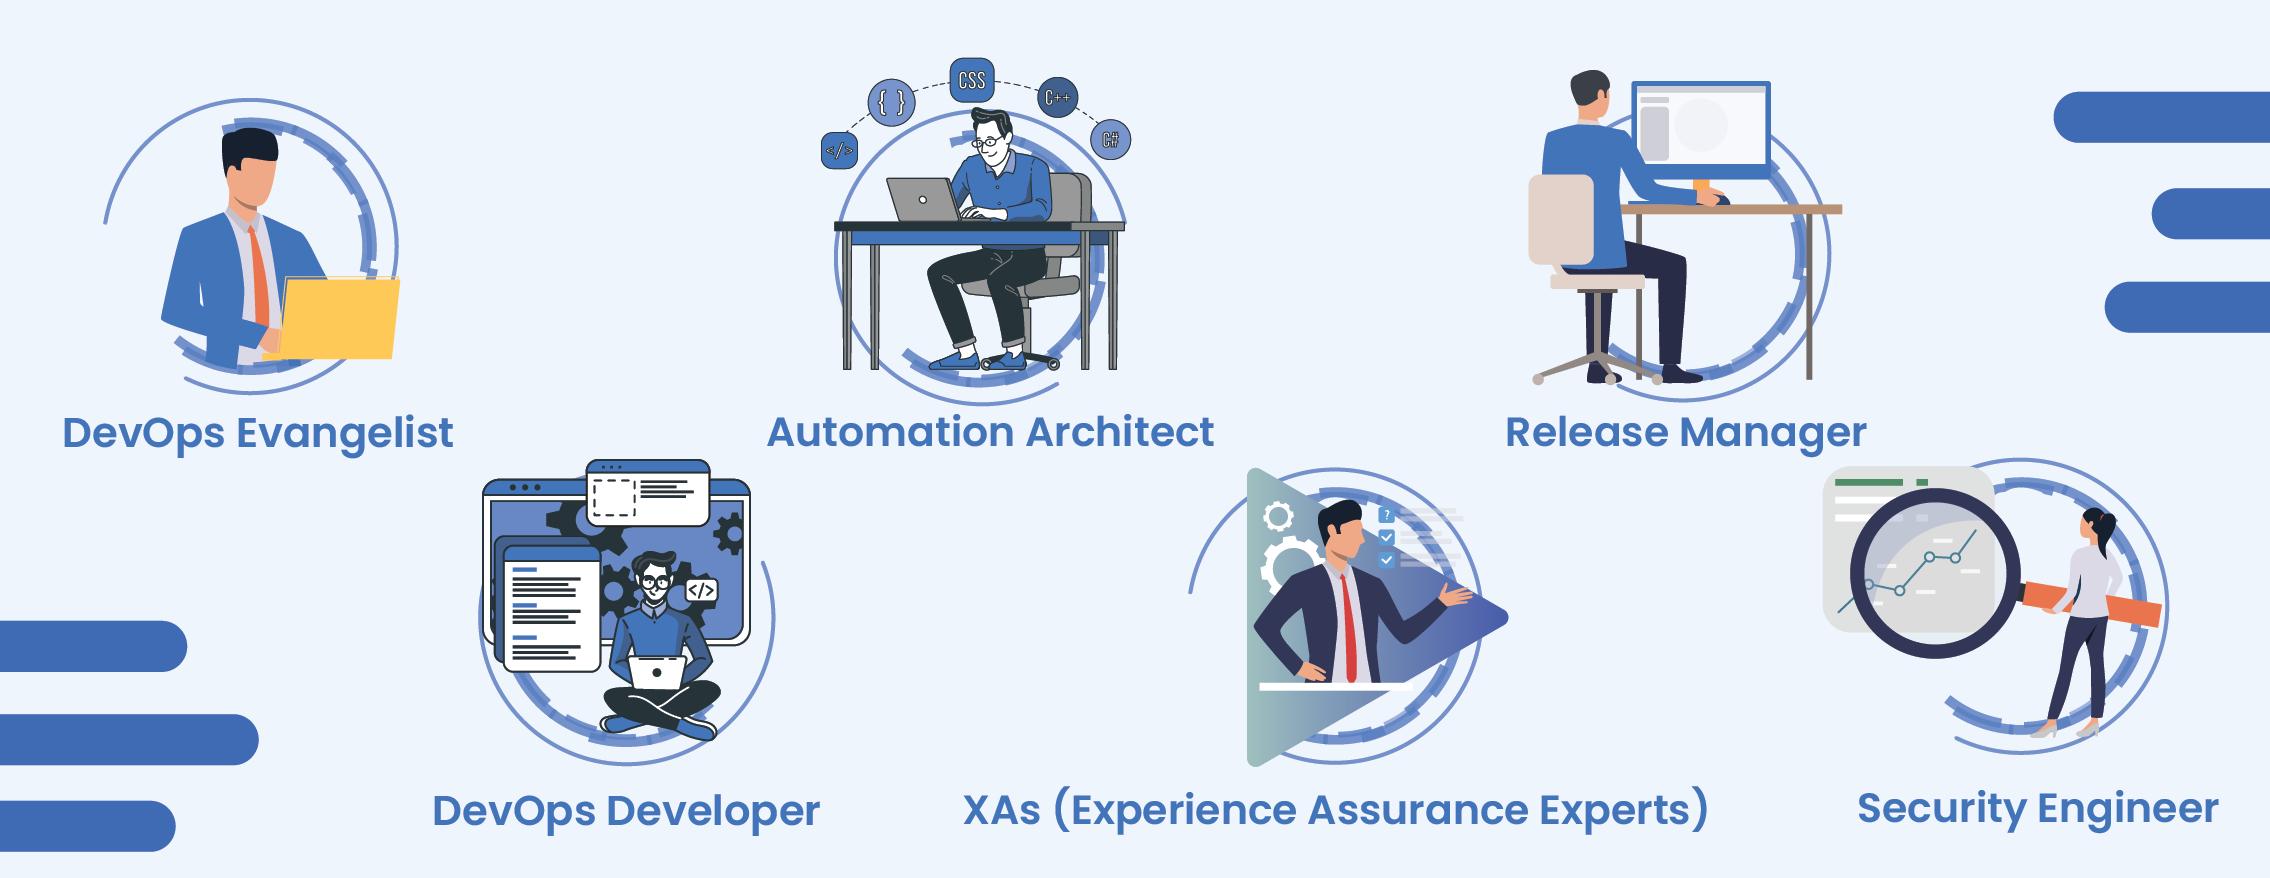 Various DevOps Job Roles and Responsibilities